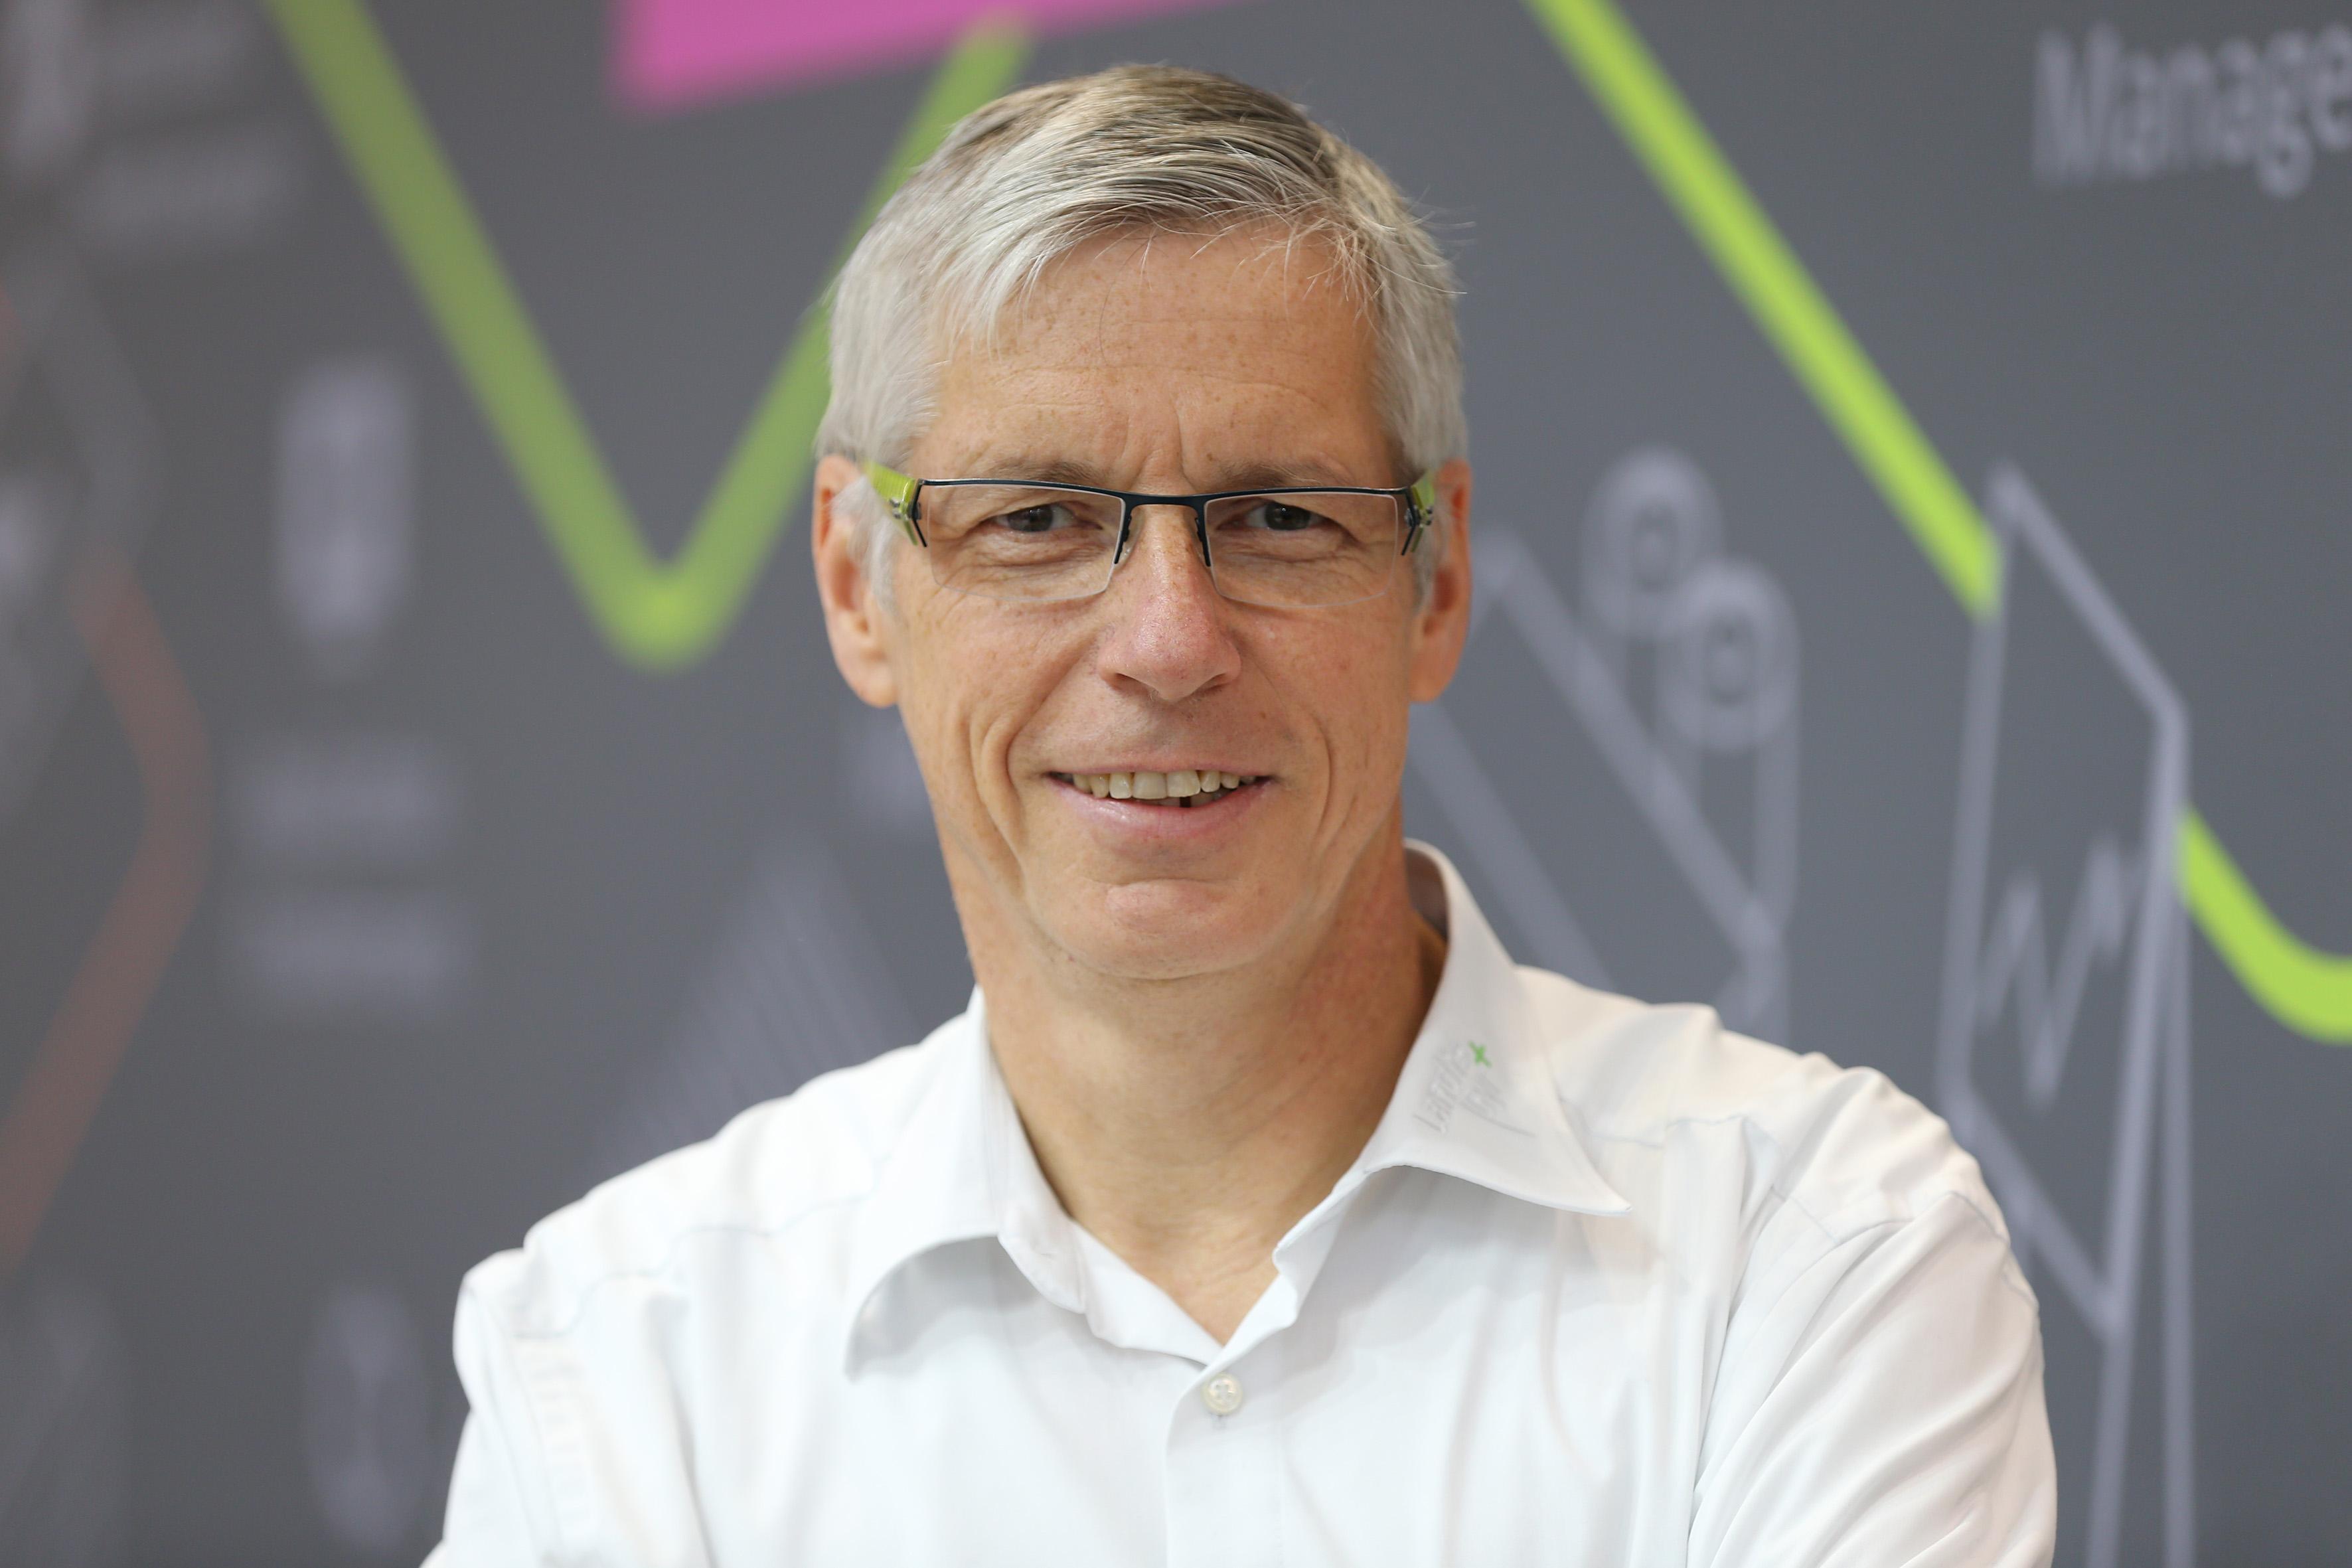 Mirko Windisch